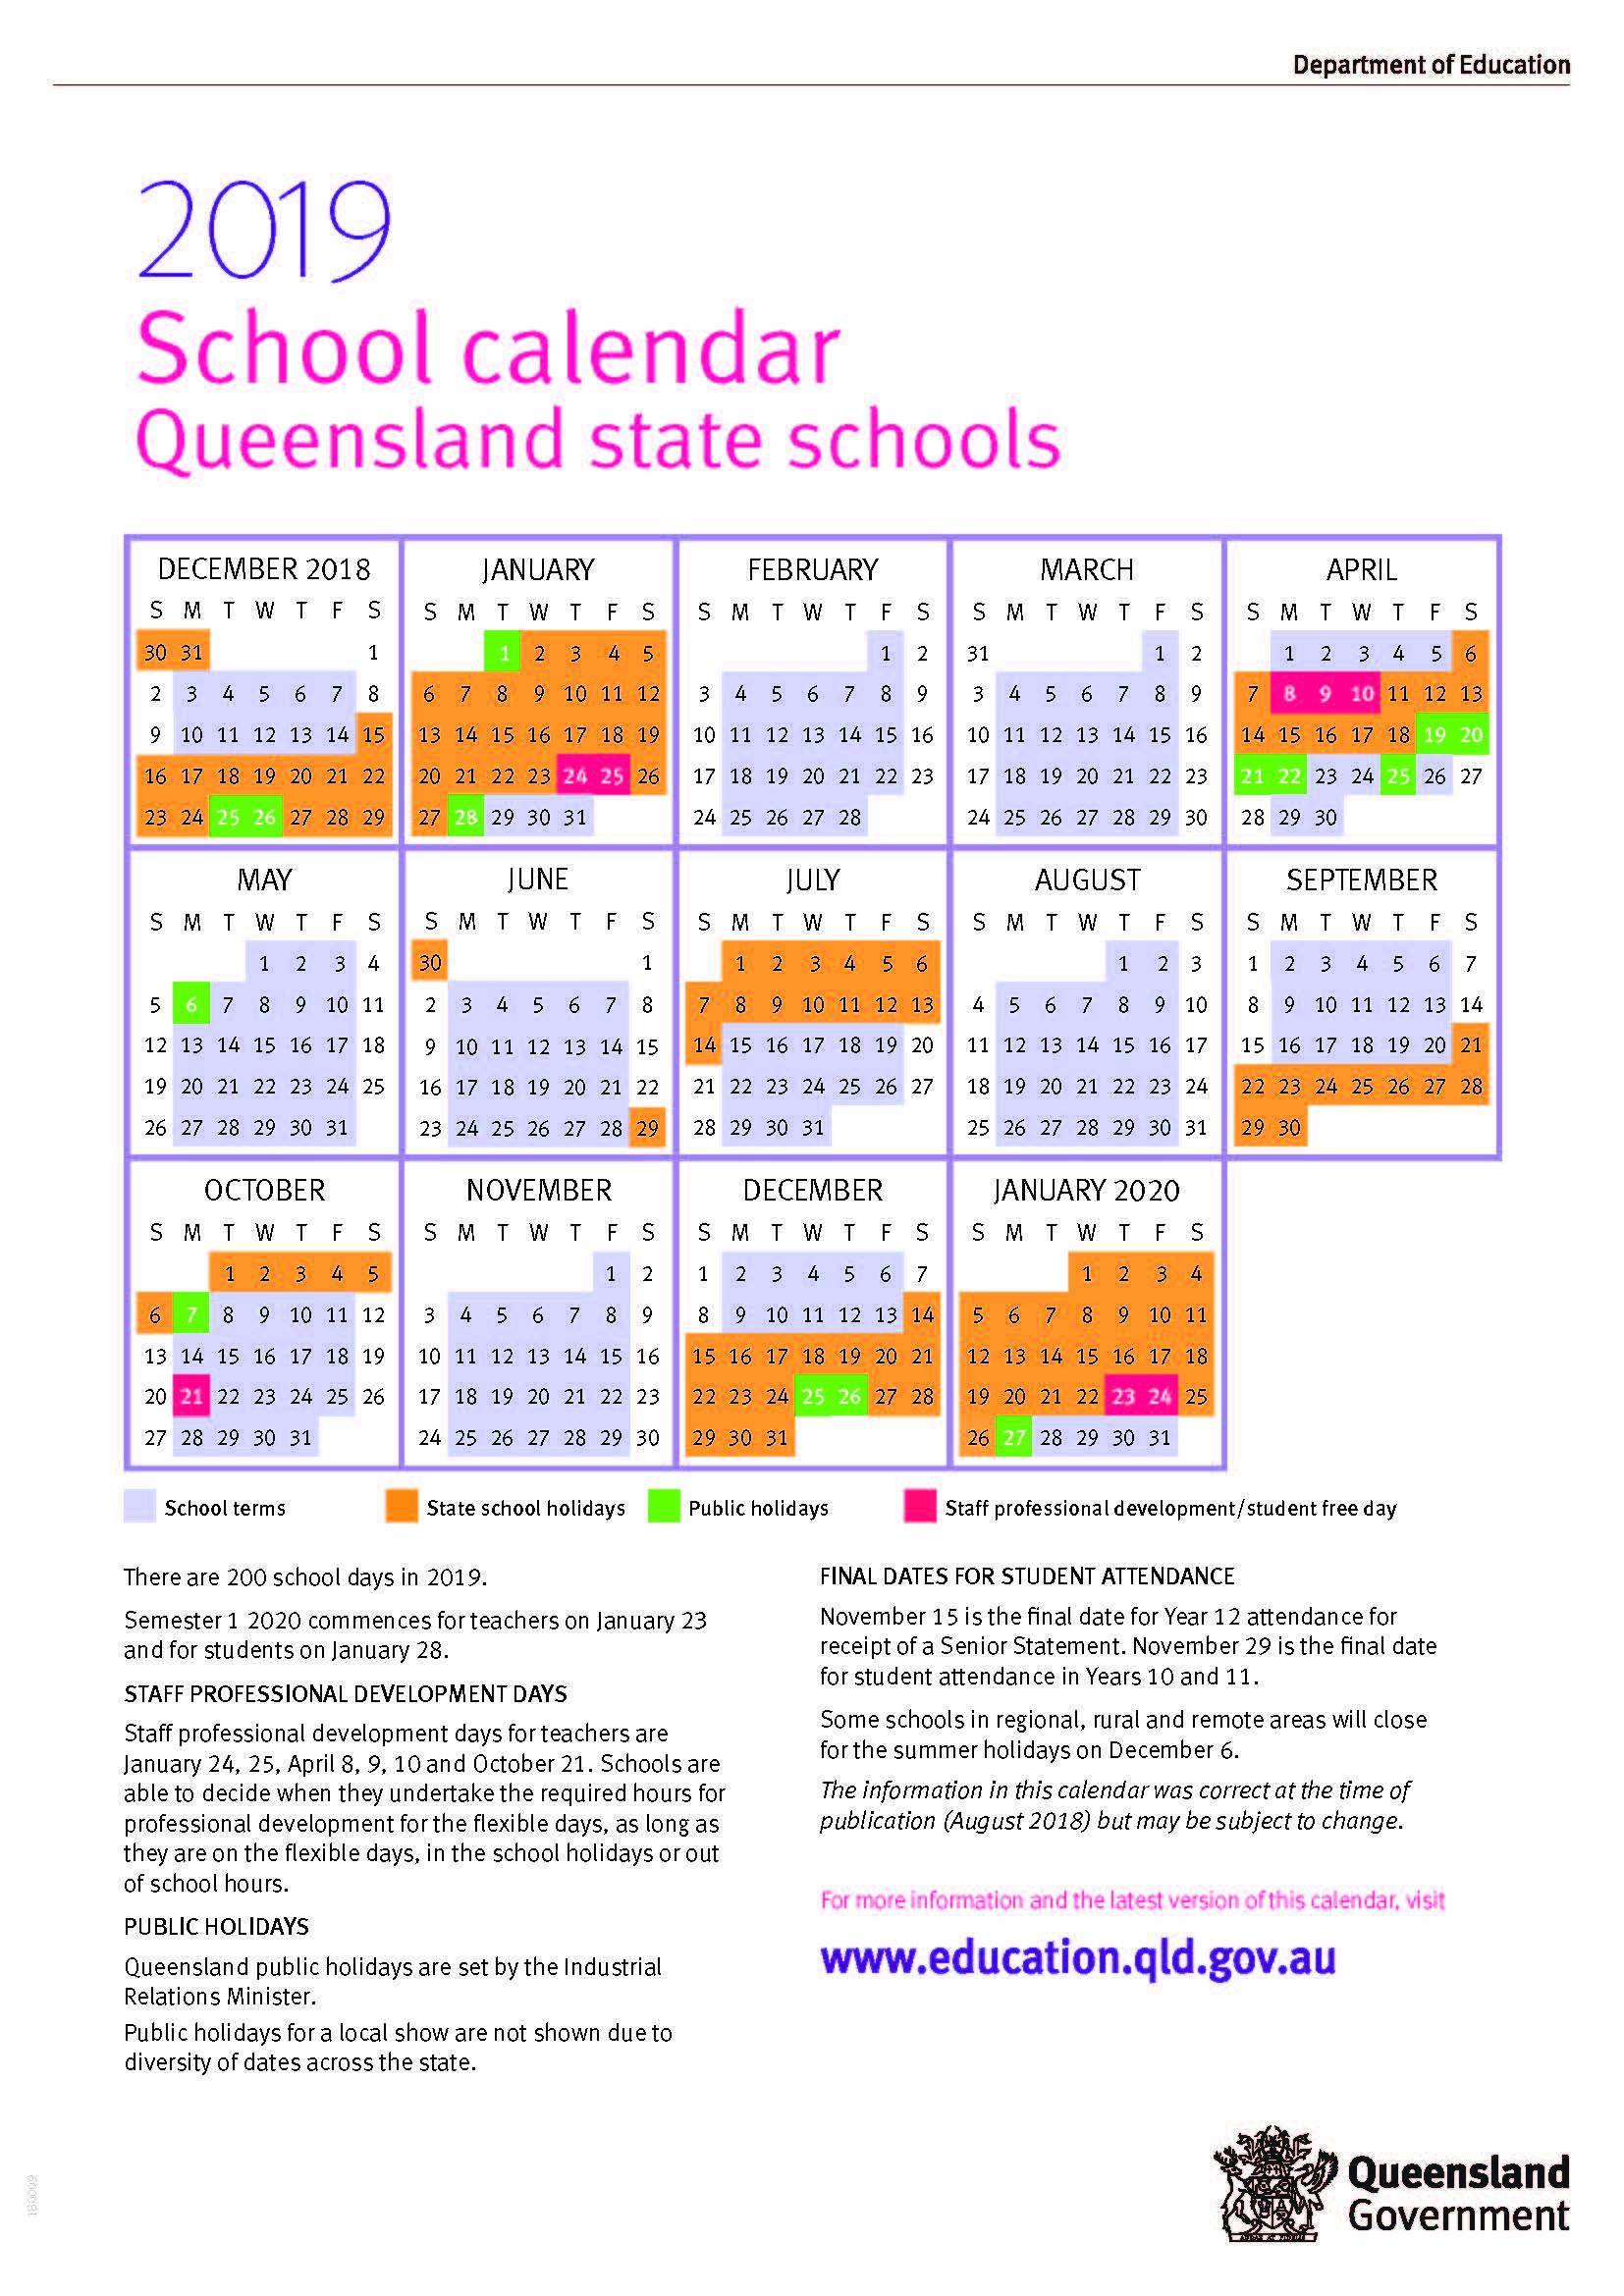 2021 Shift Calendar Free | Calendar Printables Free Blank inside Shift Schedule 2021